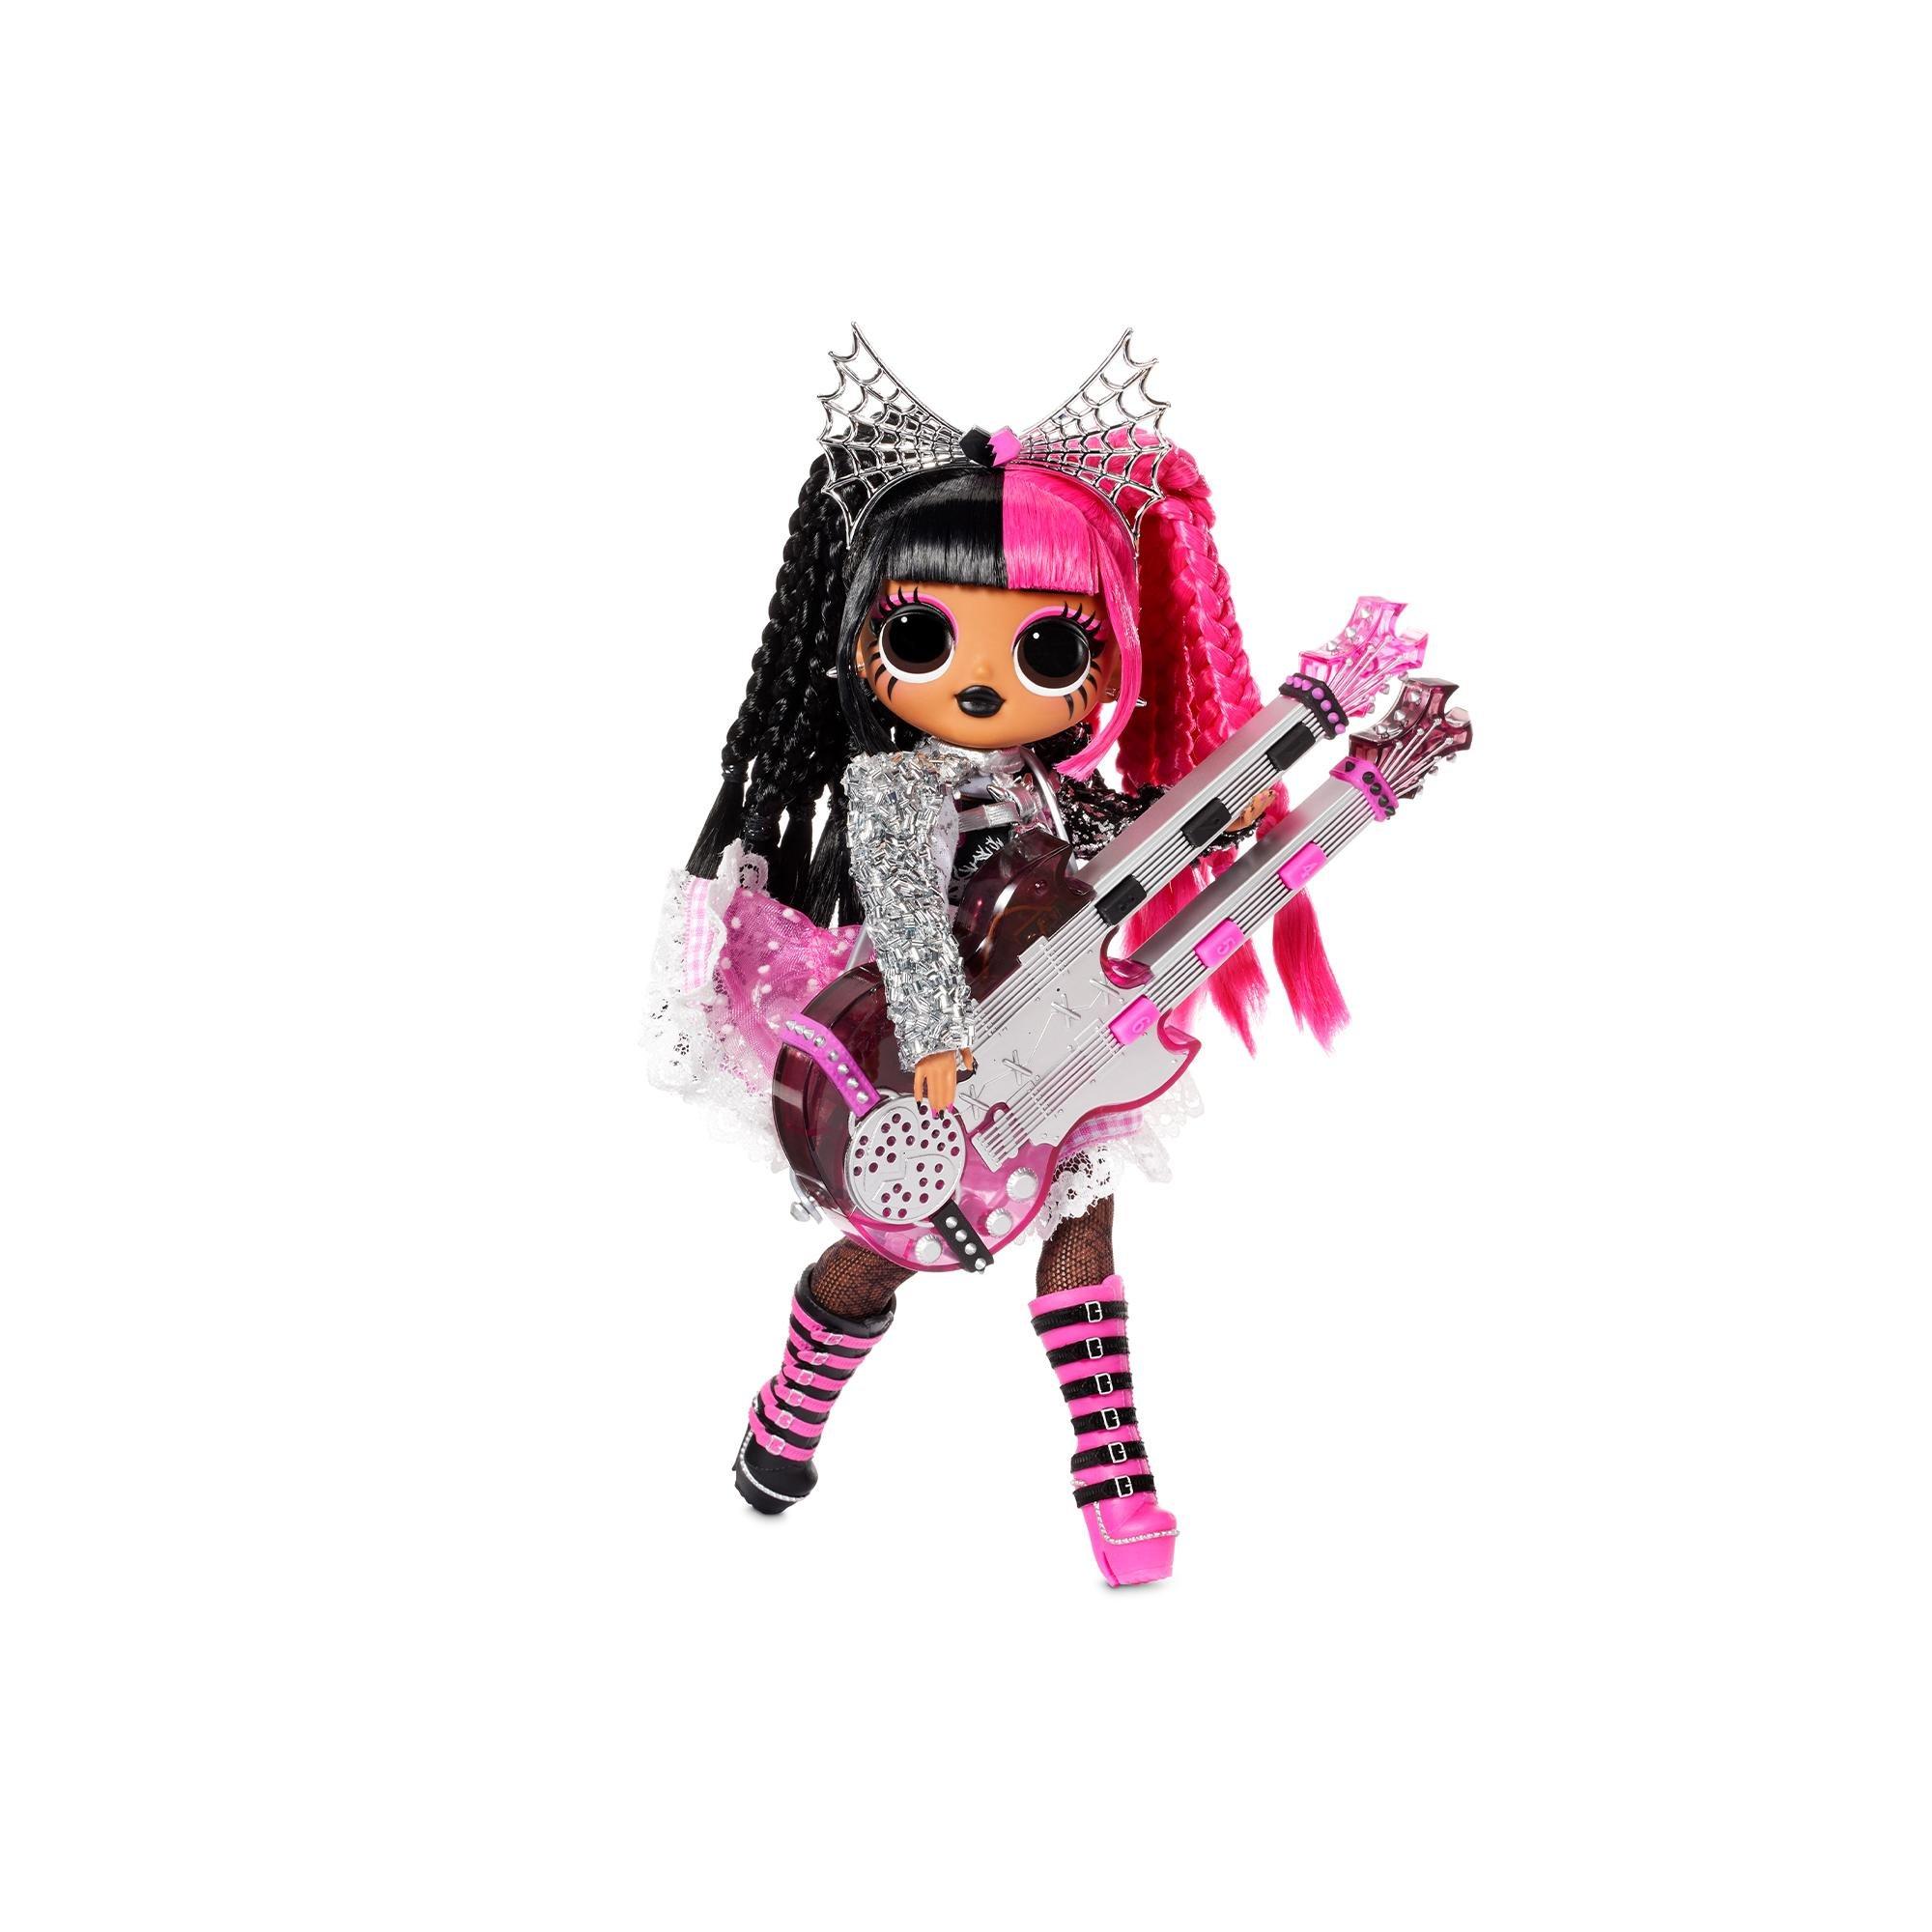 L.O.L. Surprise - OMG Remix Rock-Metal Chick+Electric Guitar (577577)